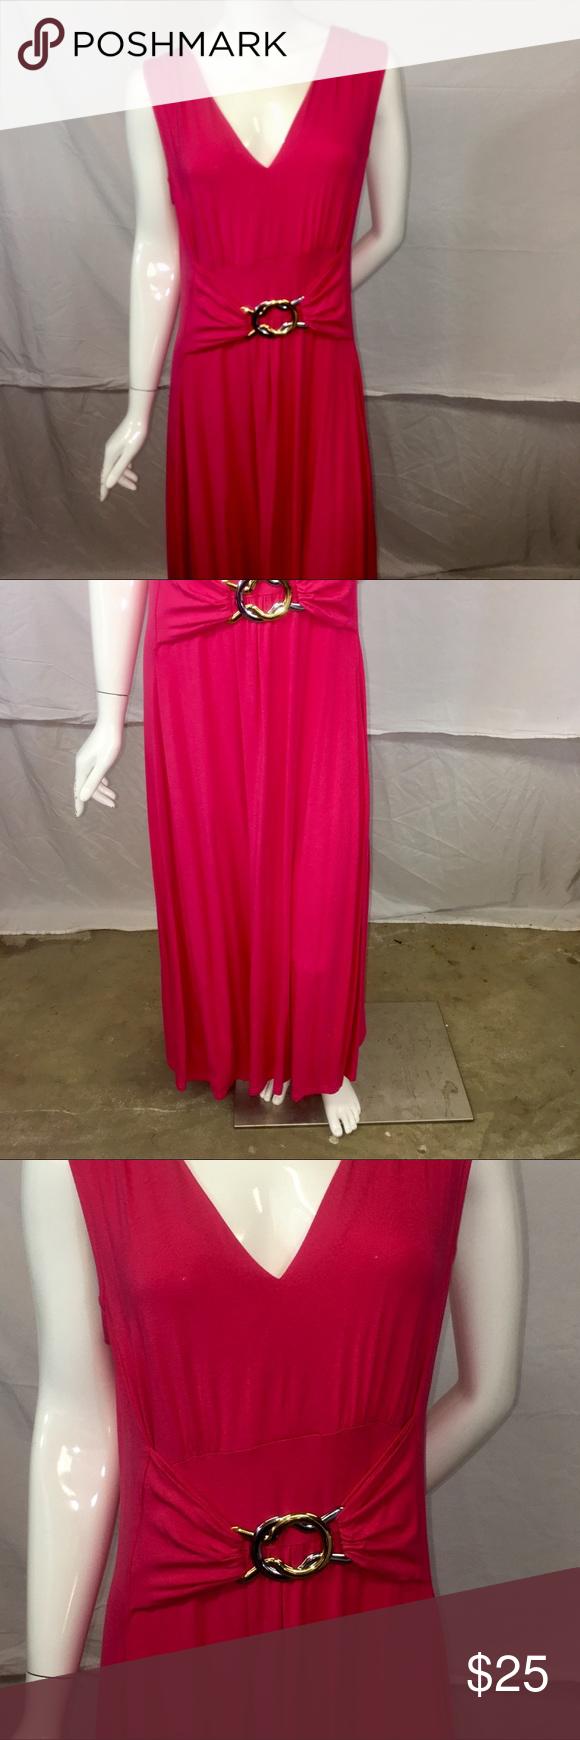 d2865a3fd Liz Lange Maternity 2 piece maxi dress Melon Super cute Liz Lange maternity maxi  dress with